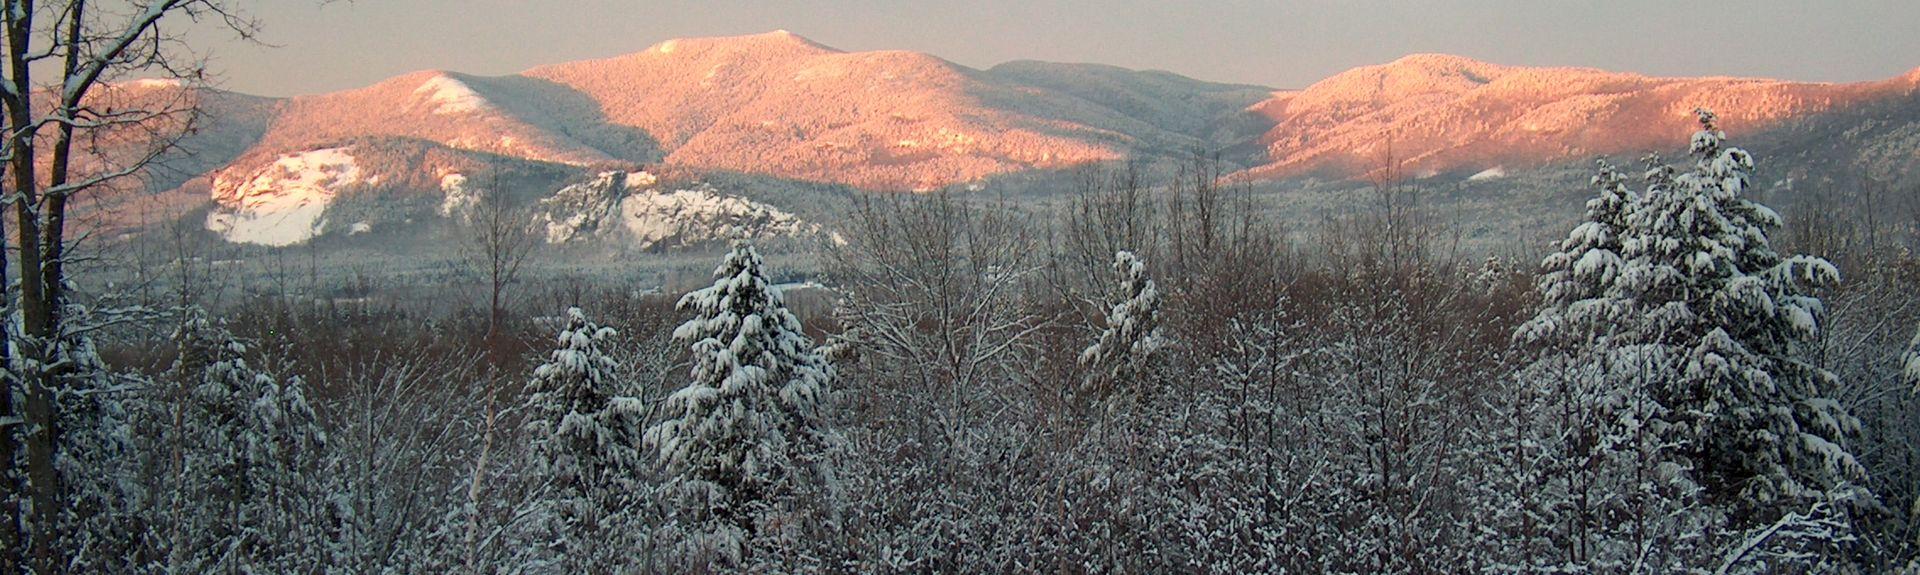 Eagle Ridge Resort, Intervale, New Hampshire, United States of America